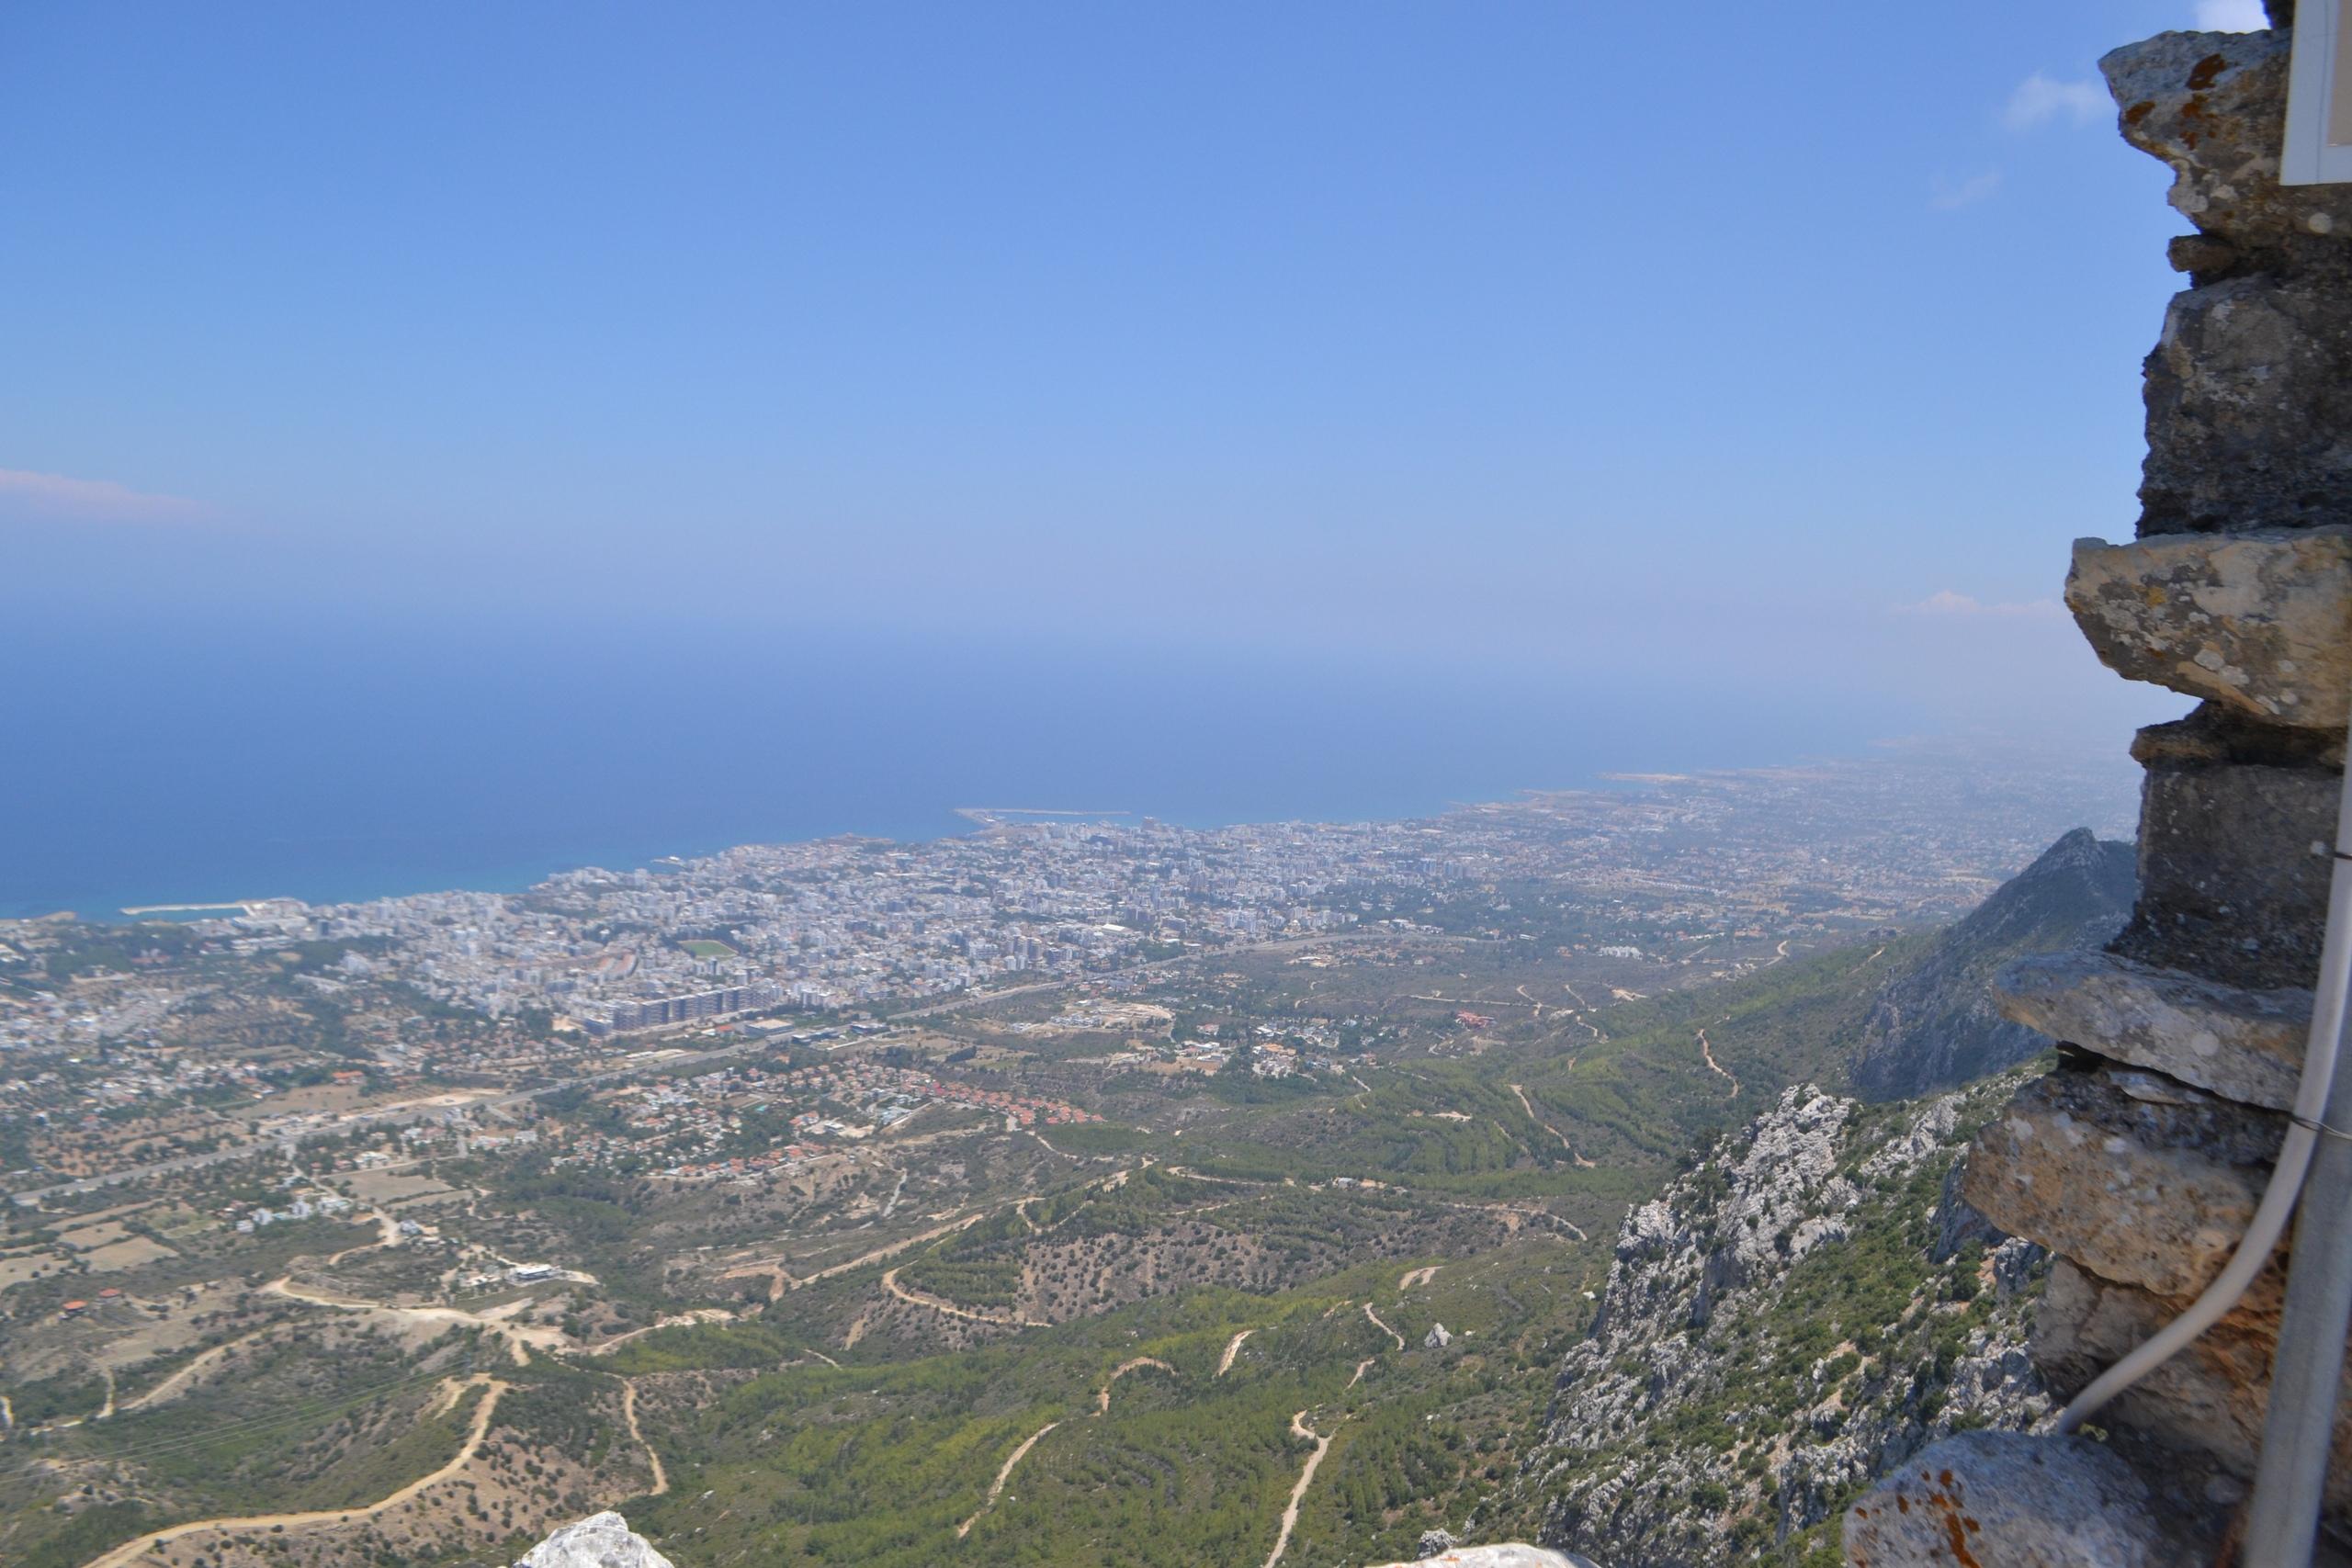 Северный Кипр. Замок Святого Иллариона. (фото). - Страница 3 Hph6T99Igks